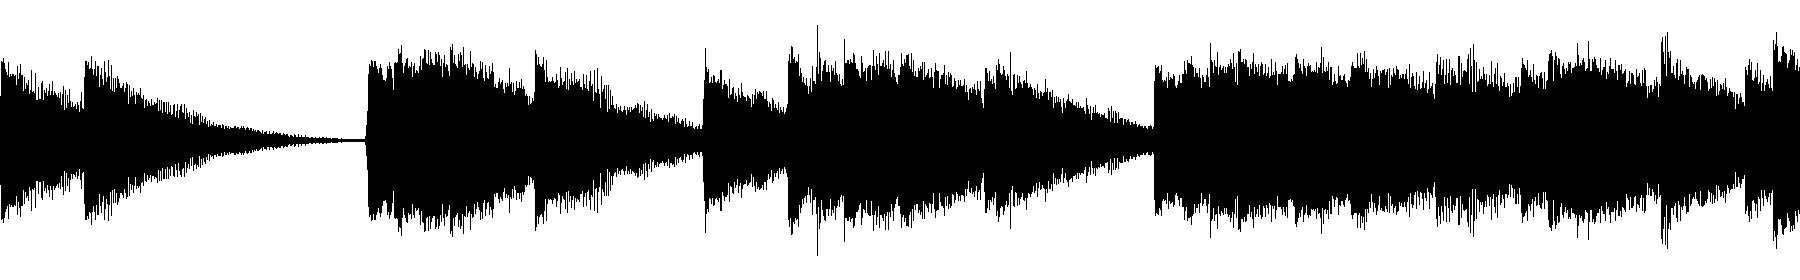 dts chordlp 23b cm dry